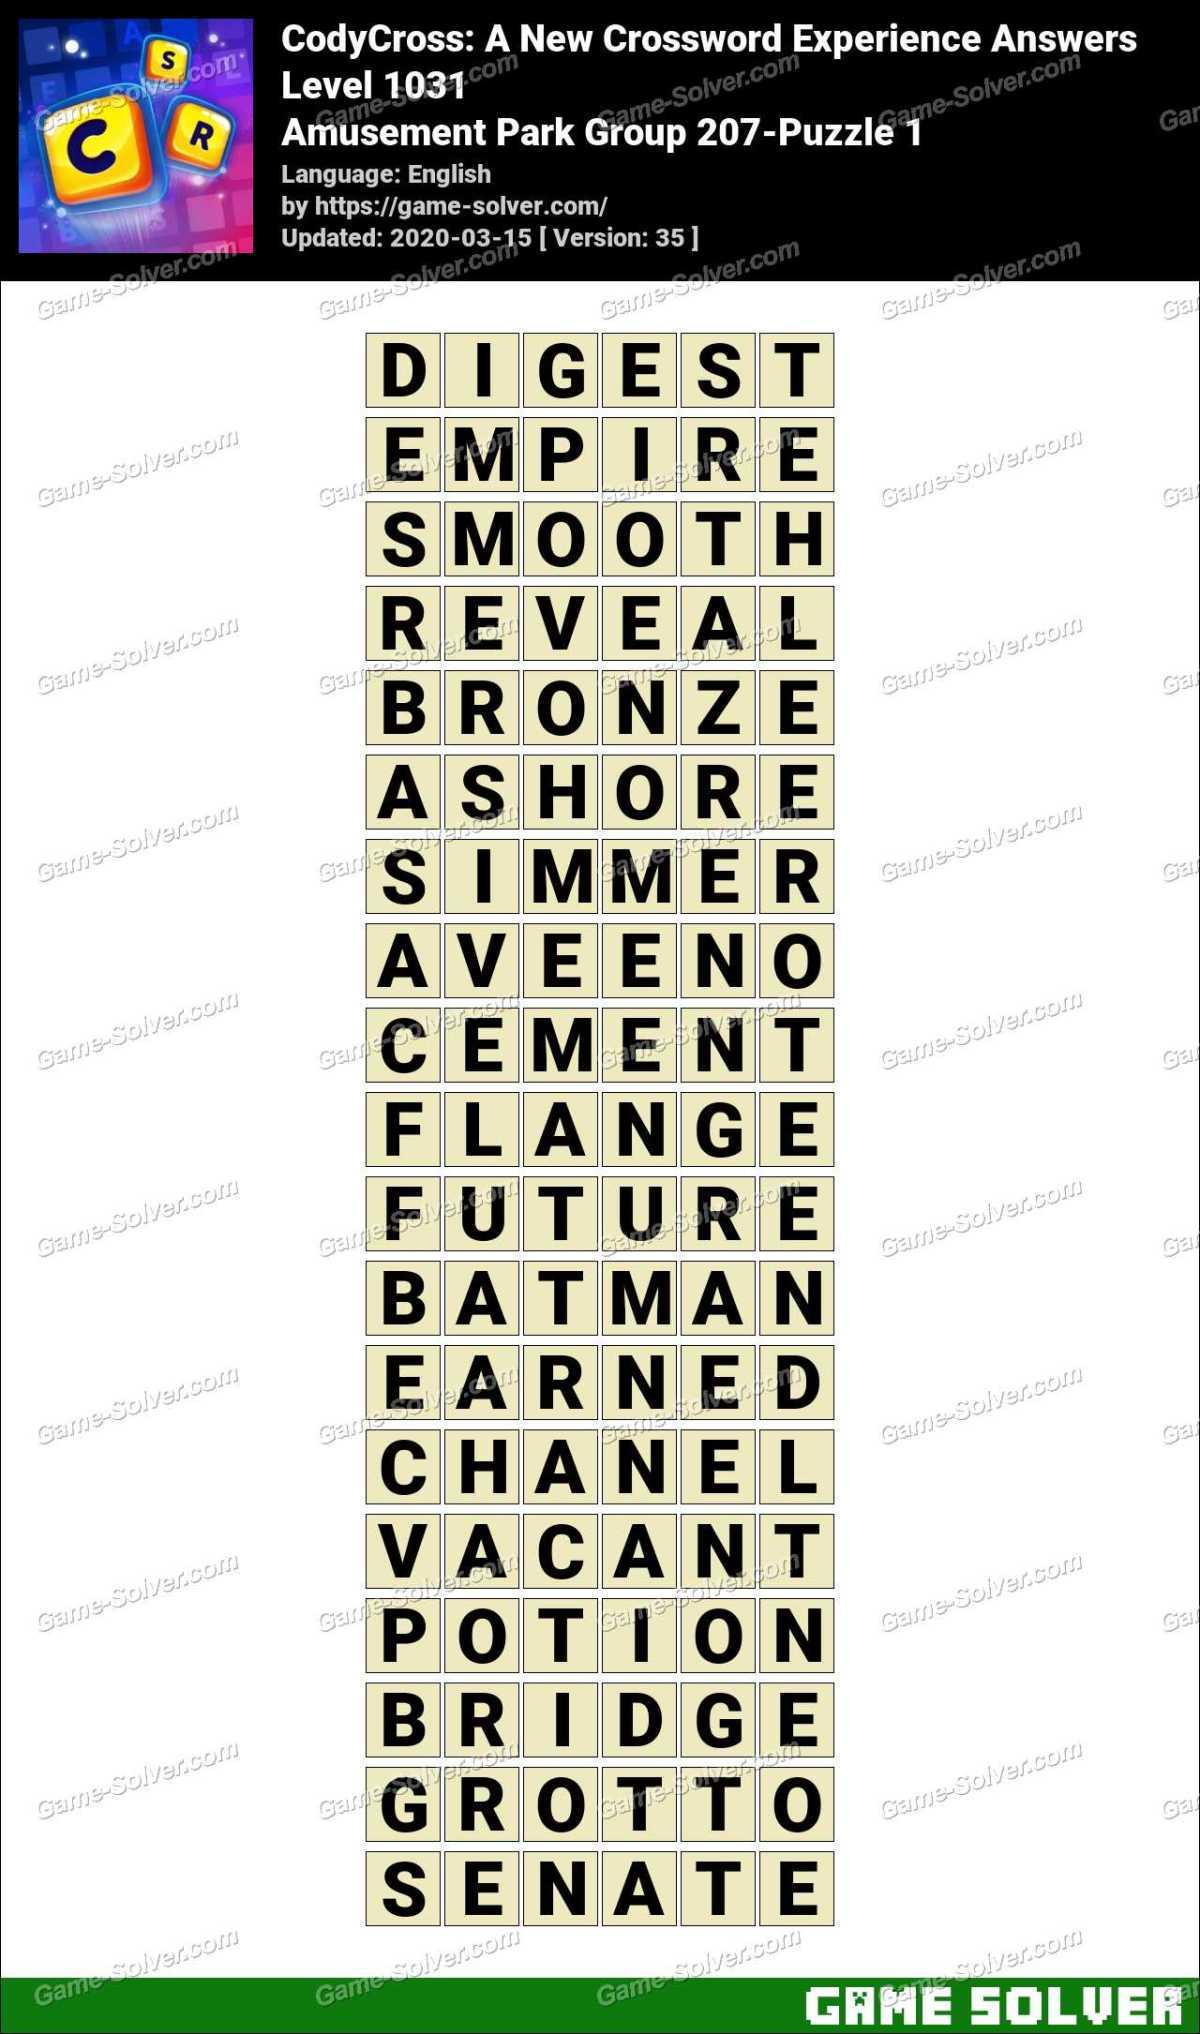 CodyCross Amusement Park Group 207-Puzzle 1 Answers